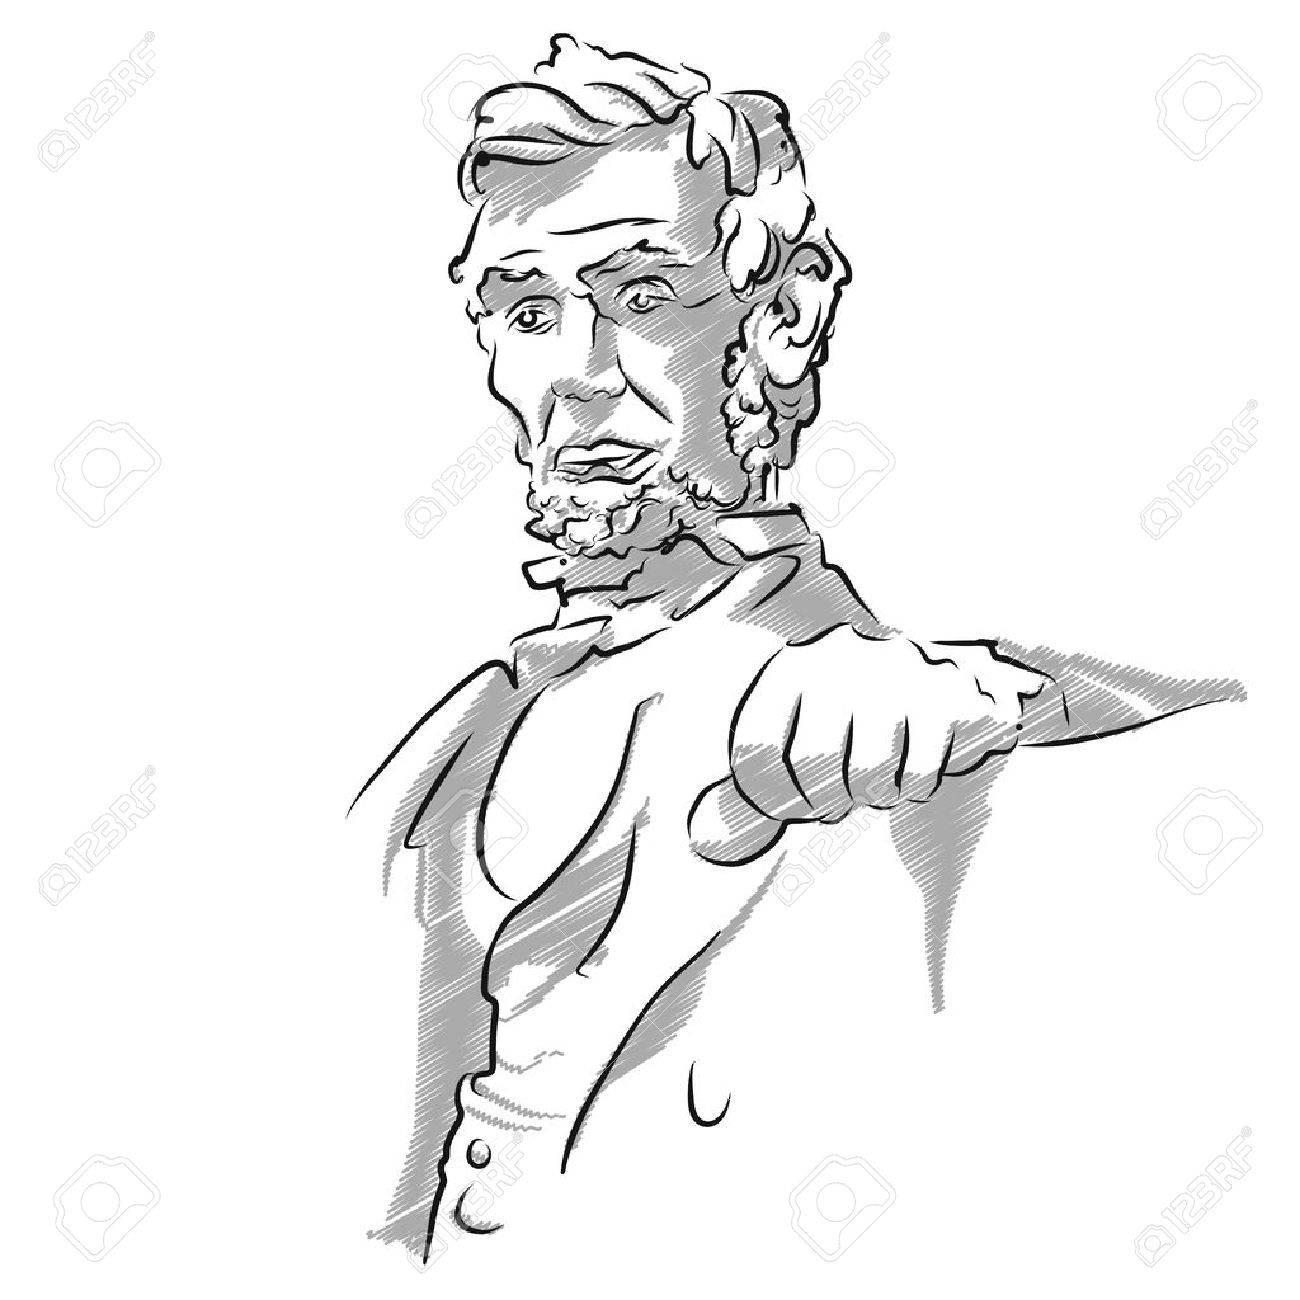 1300x1300 Abraham Lincoln Memorial Sketch, Vector Outline Version Royalty